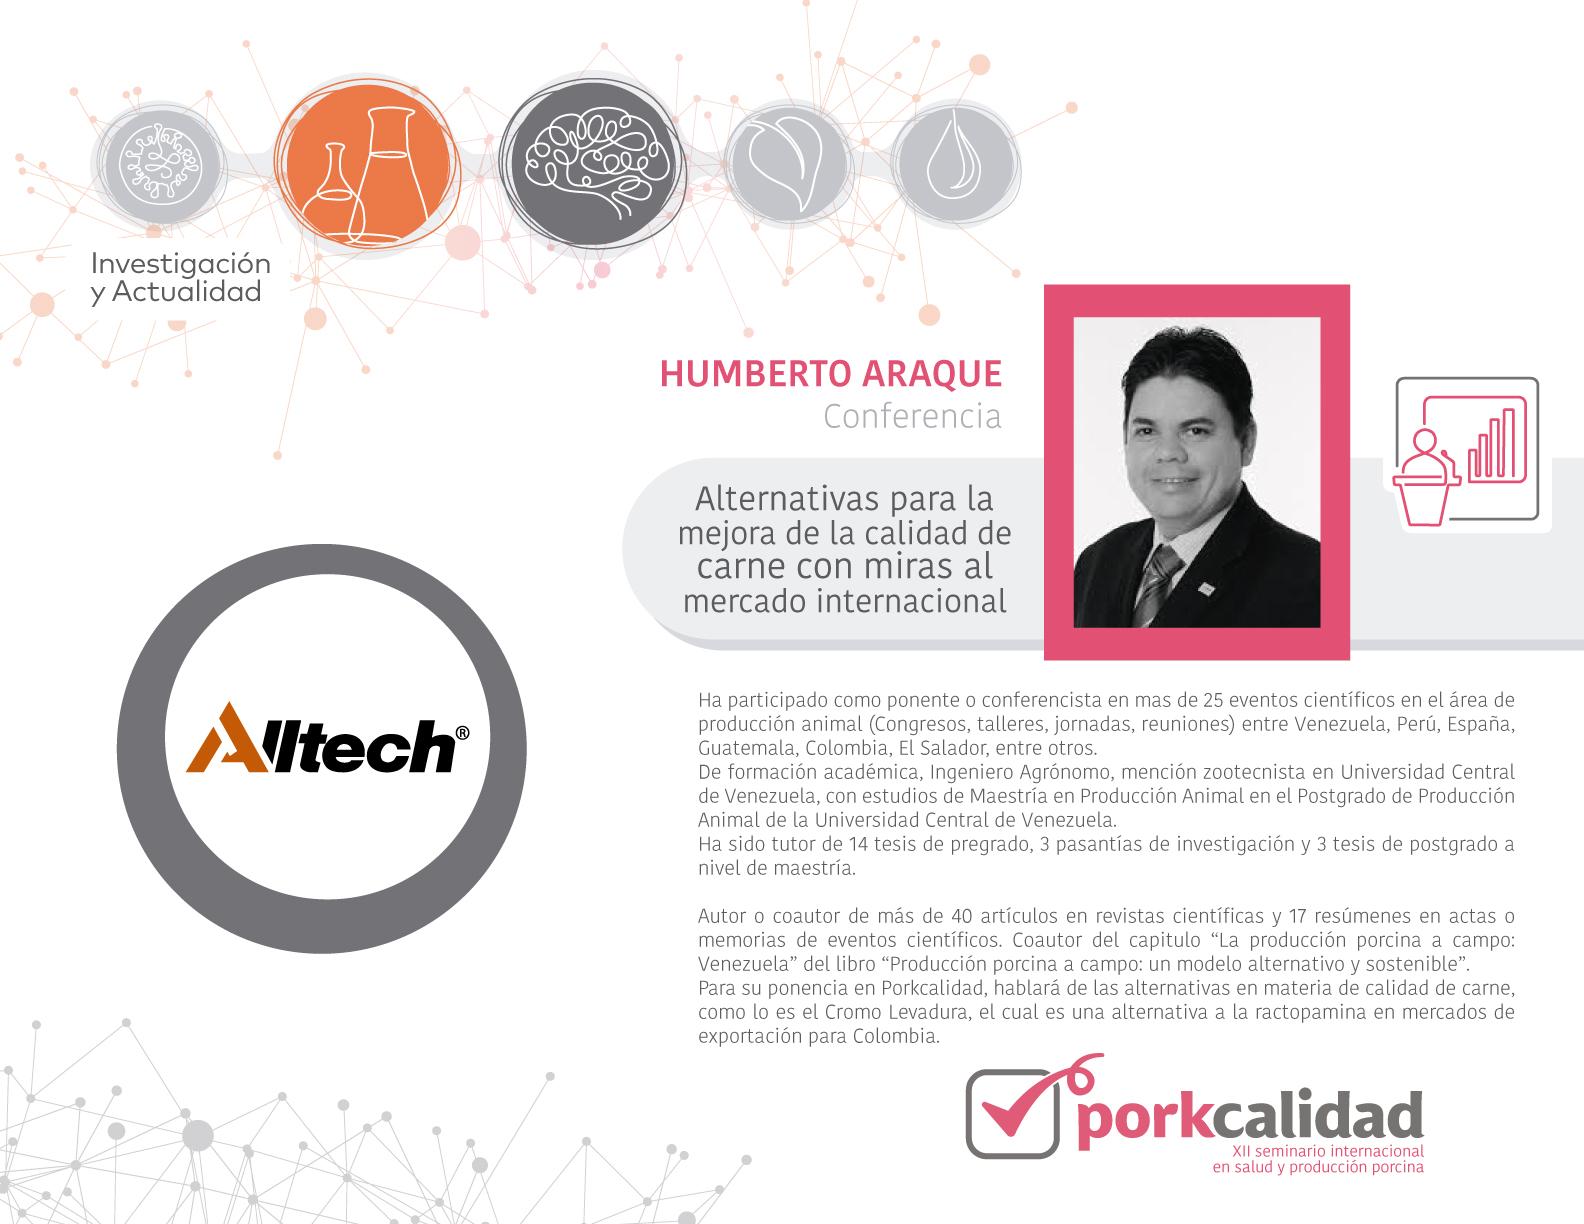 Porkcalidad2019_Alltech